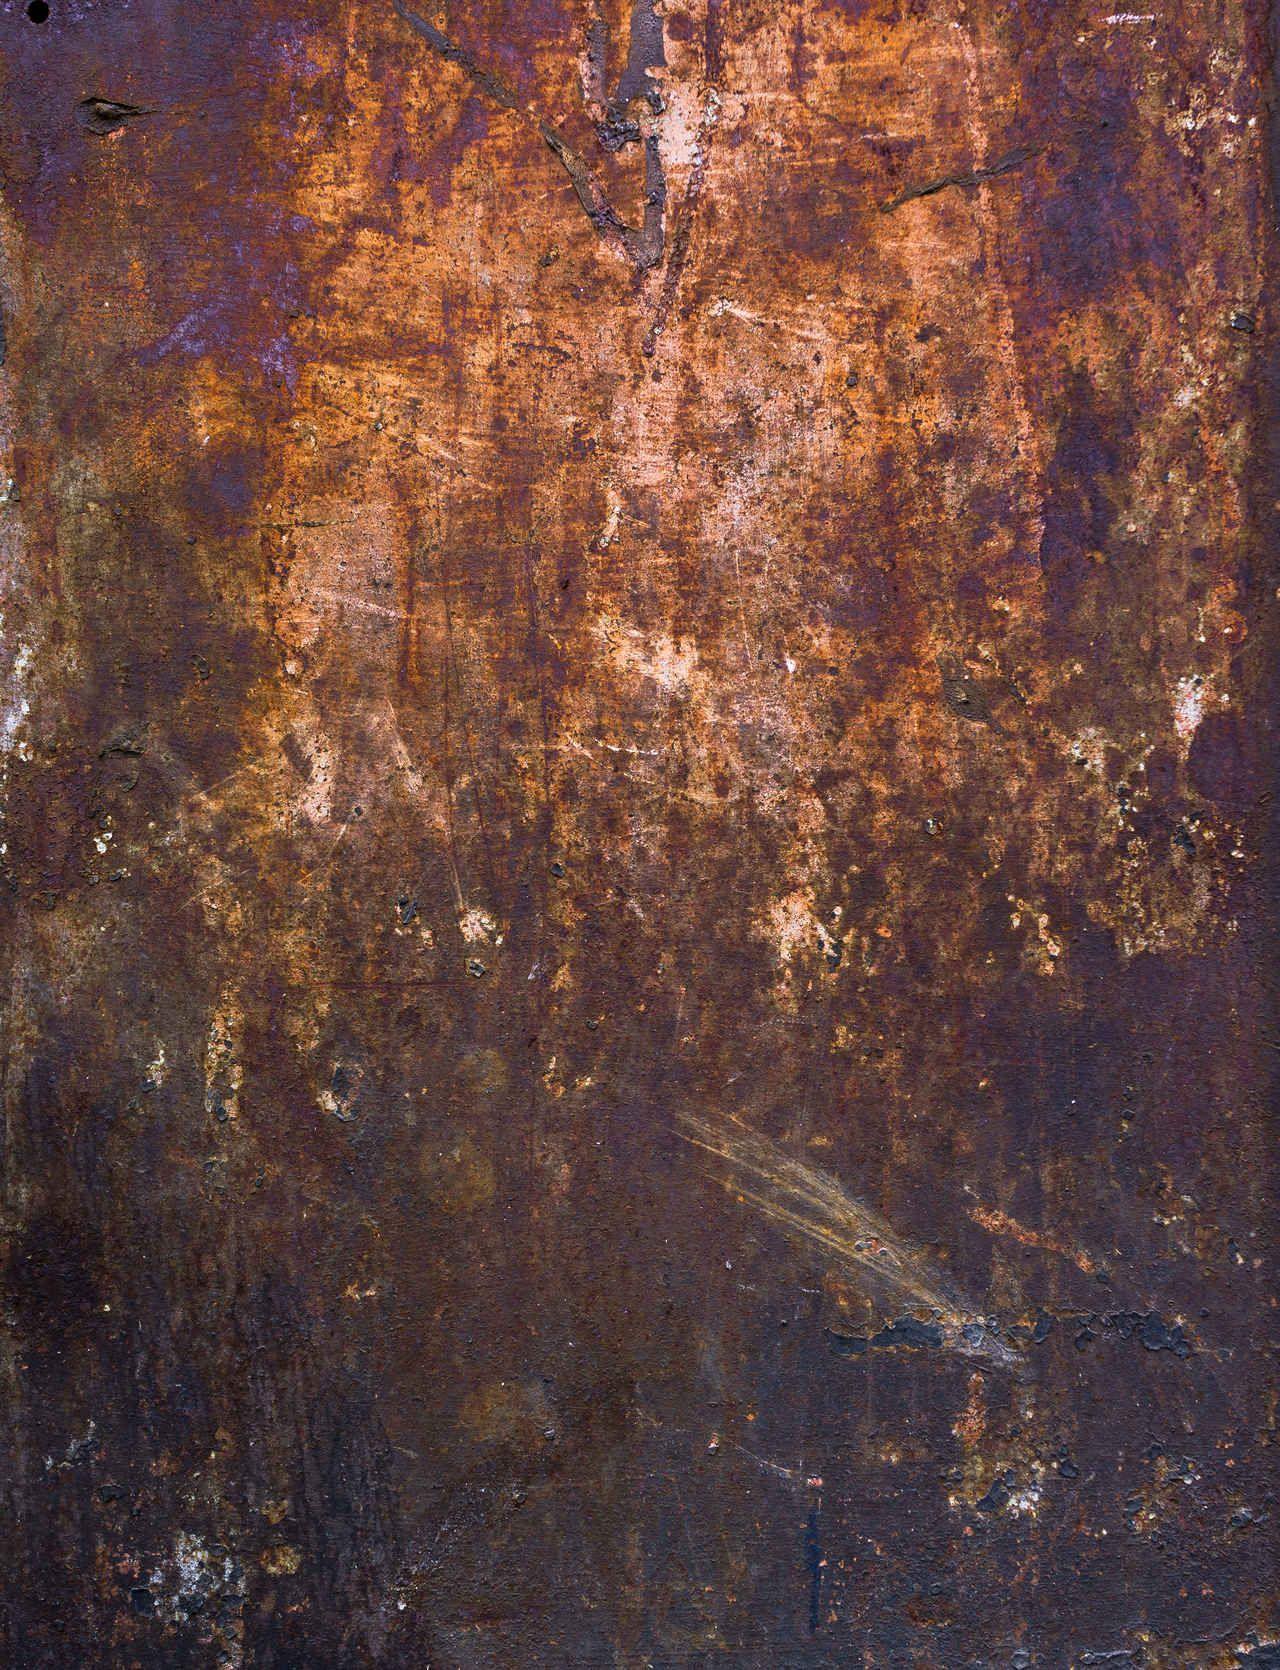 Dark Rusty Metal Sheet Texture | Grunge textures, Metal texture ...